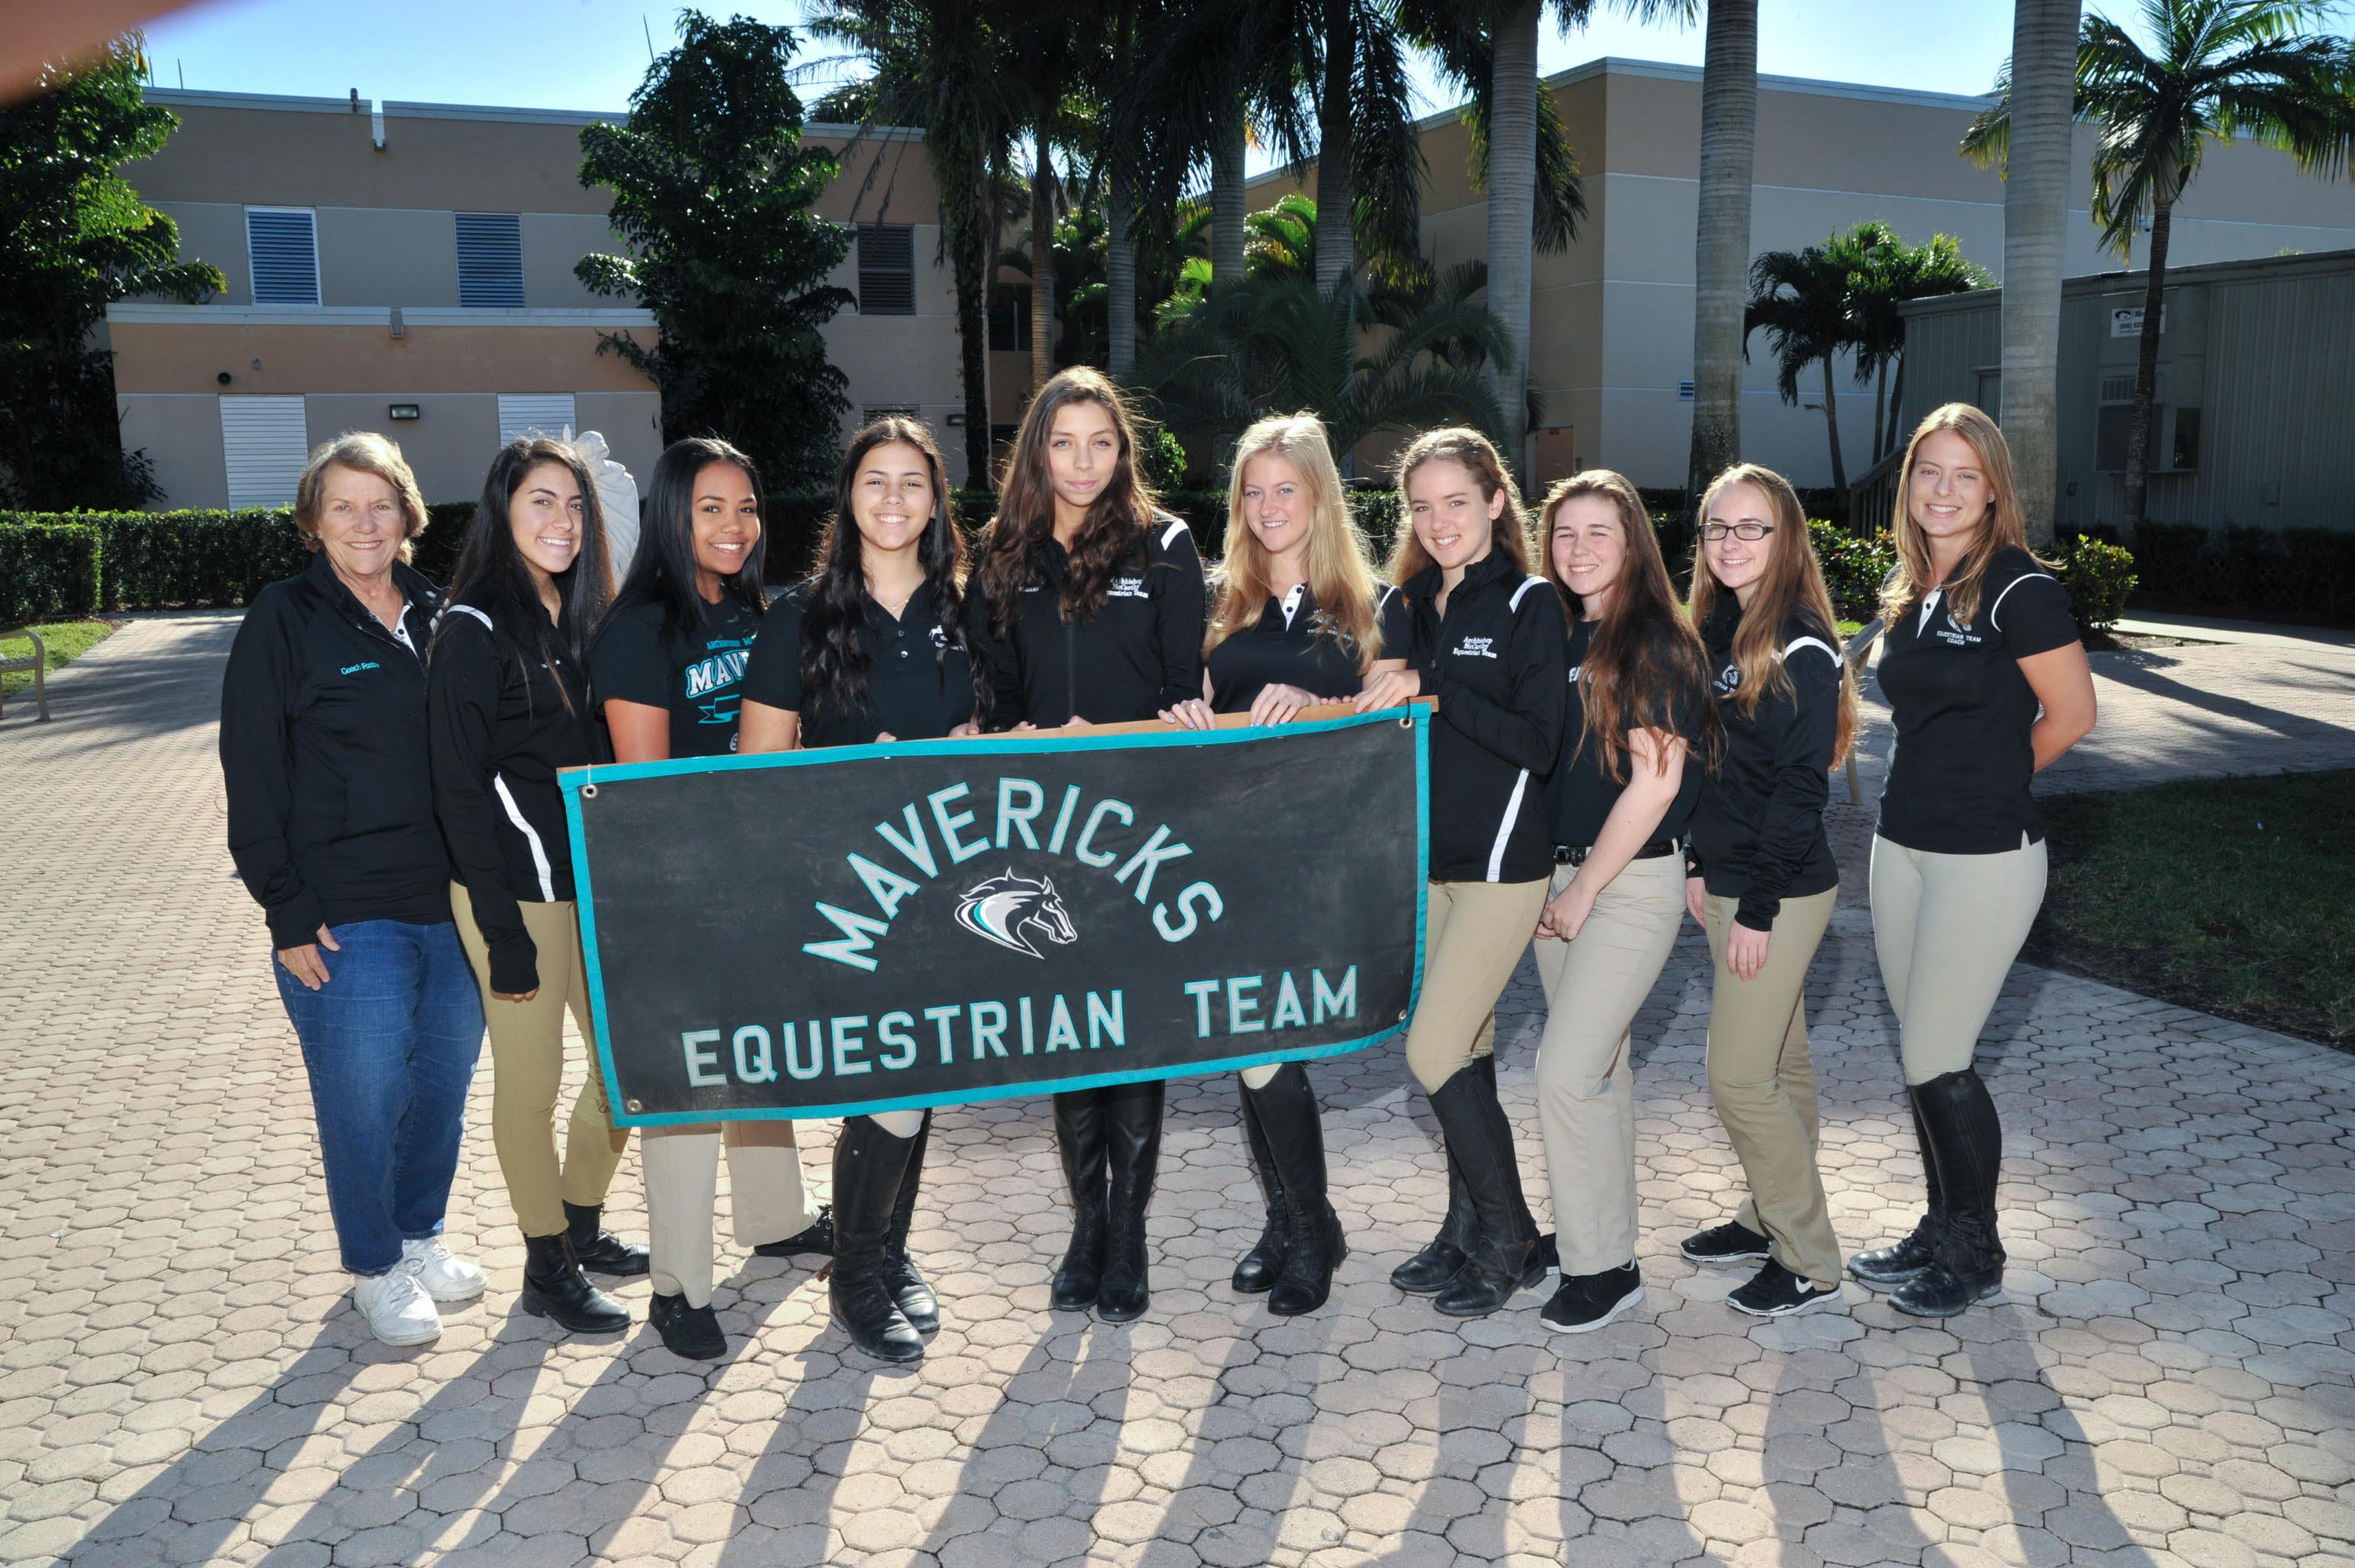 Contact Us - UF Equestrian Club